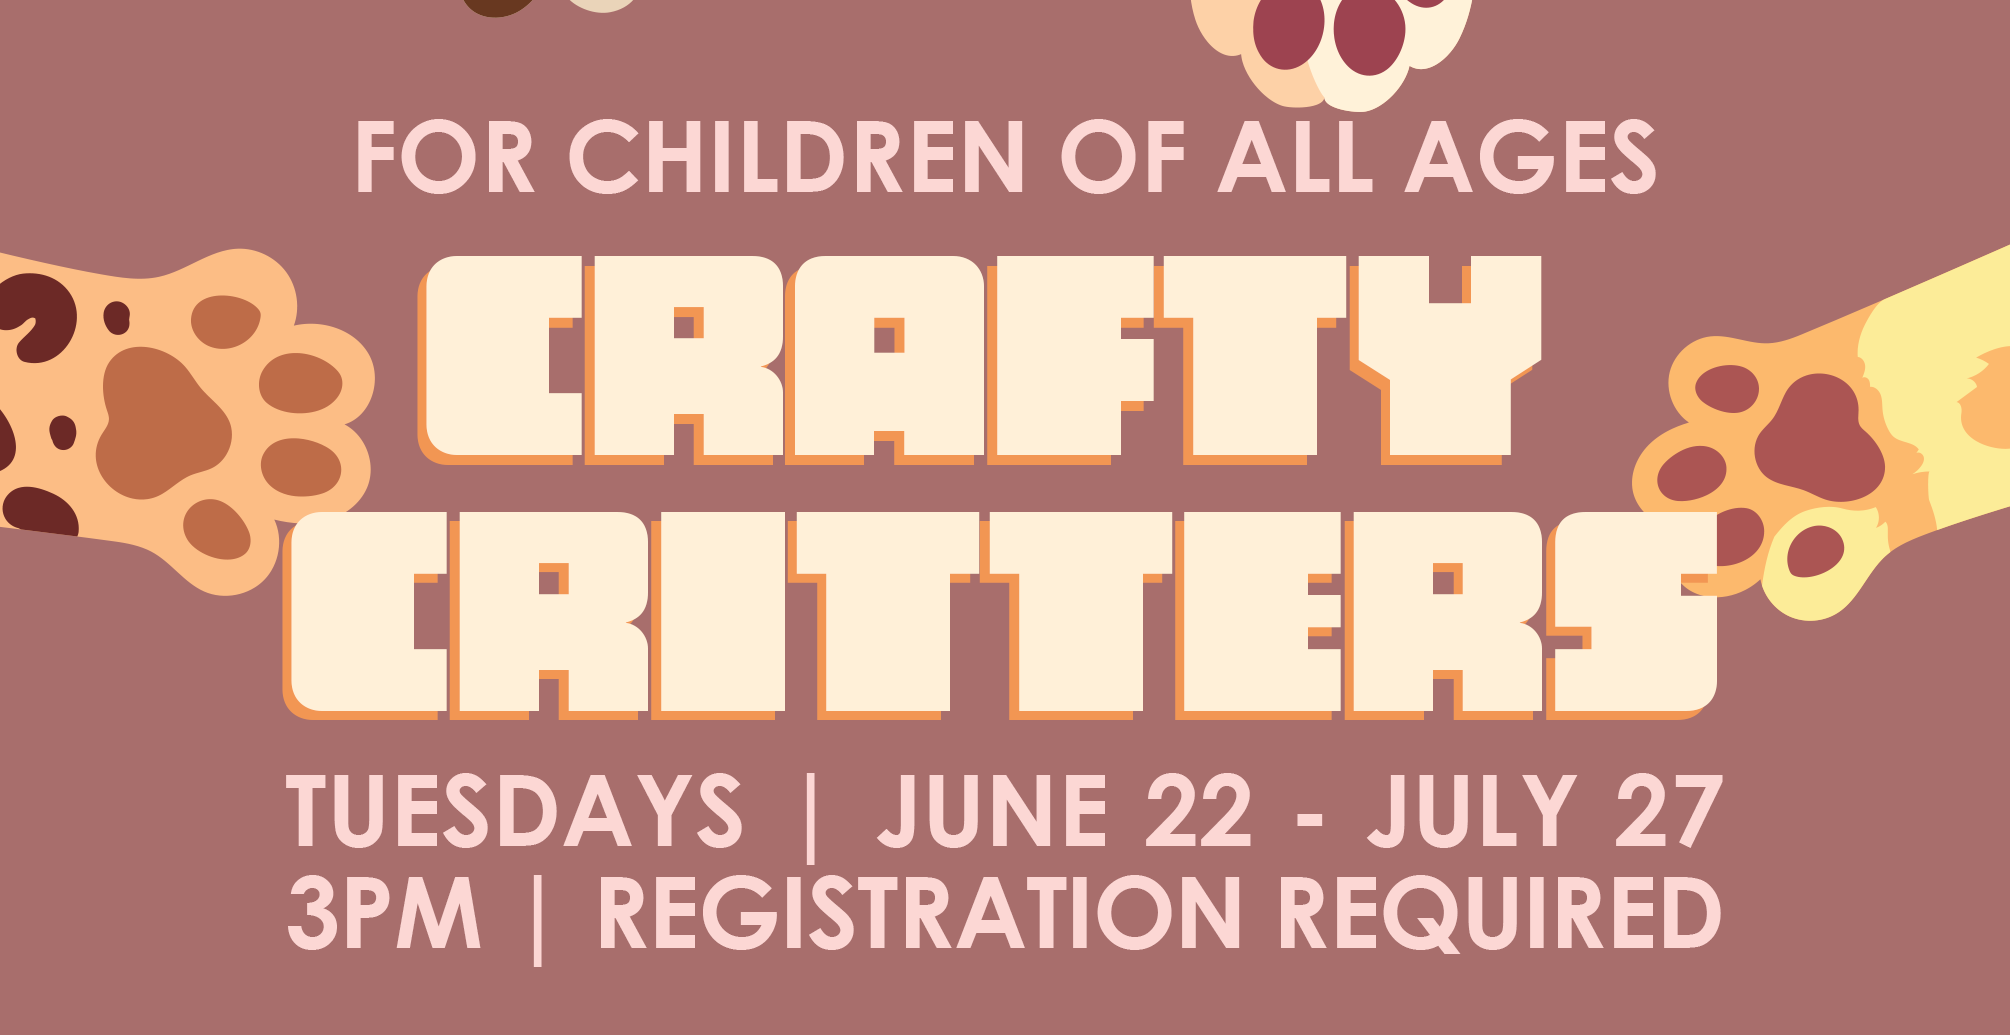 2021-06-CHILDRENS-Milan-Crafty-Critters-Slide